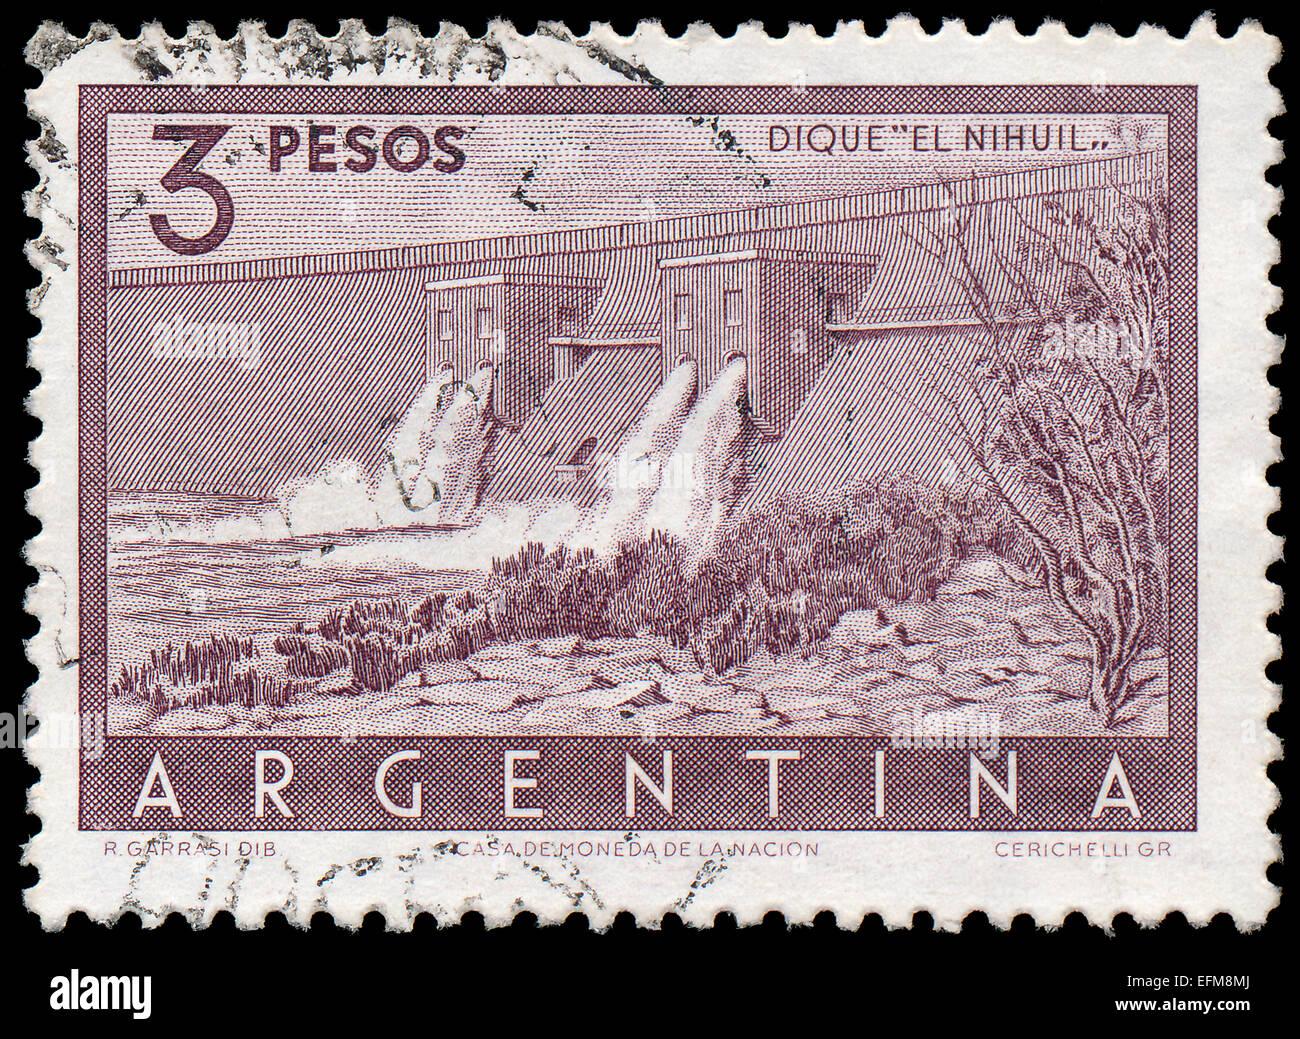 Dedicated Old Argentine Republic Stamp Stamps Argentina